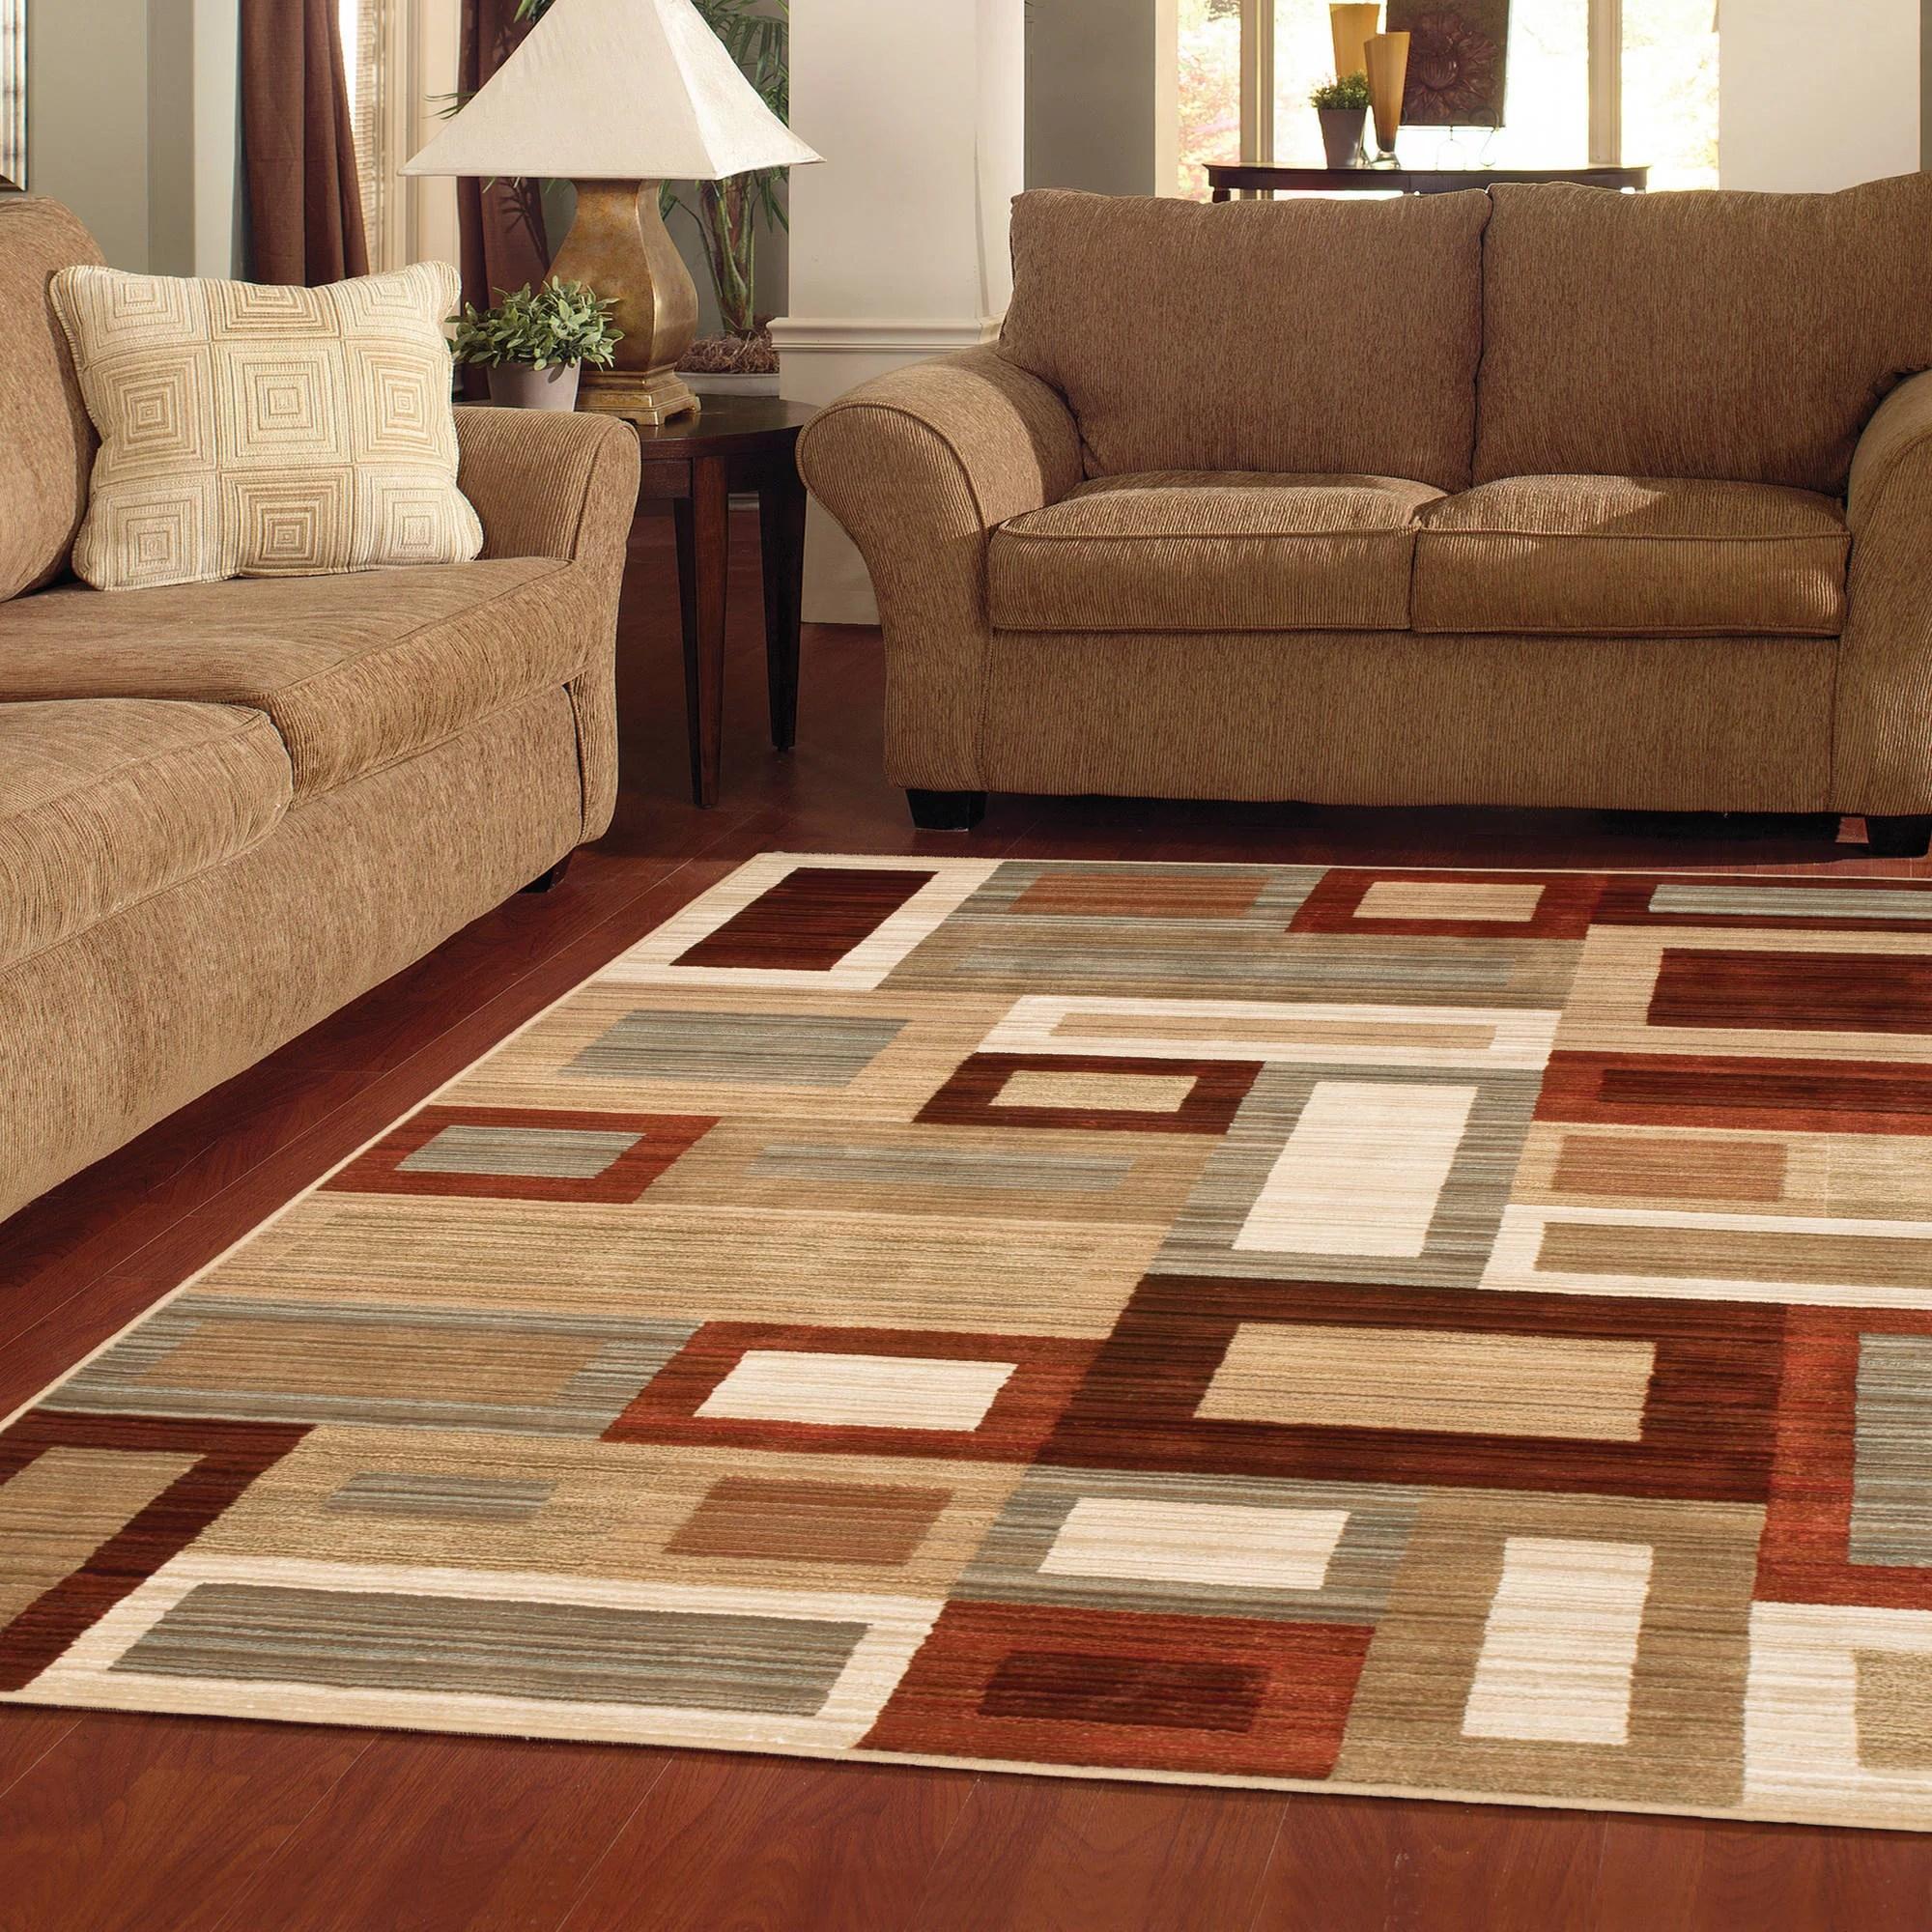 YnJhbmQz kitchen floor mats walmart Better Homes or Gardens Franklin Squares Area Rug or Runner